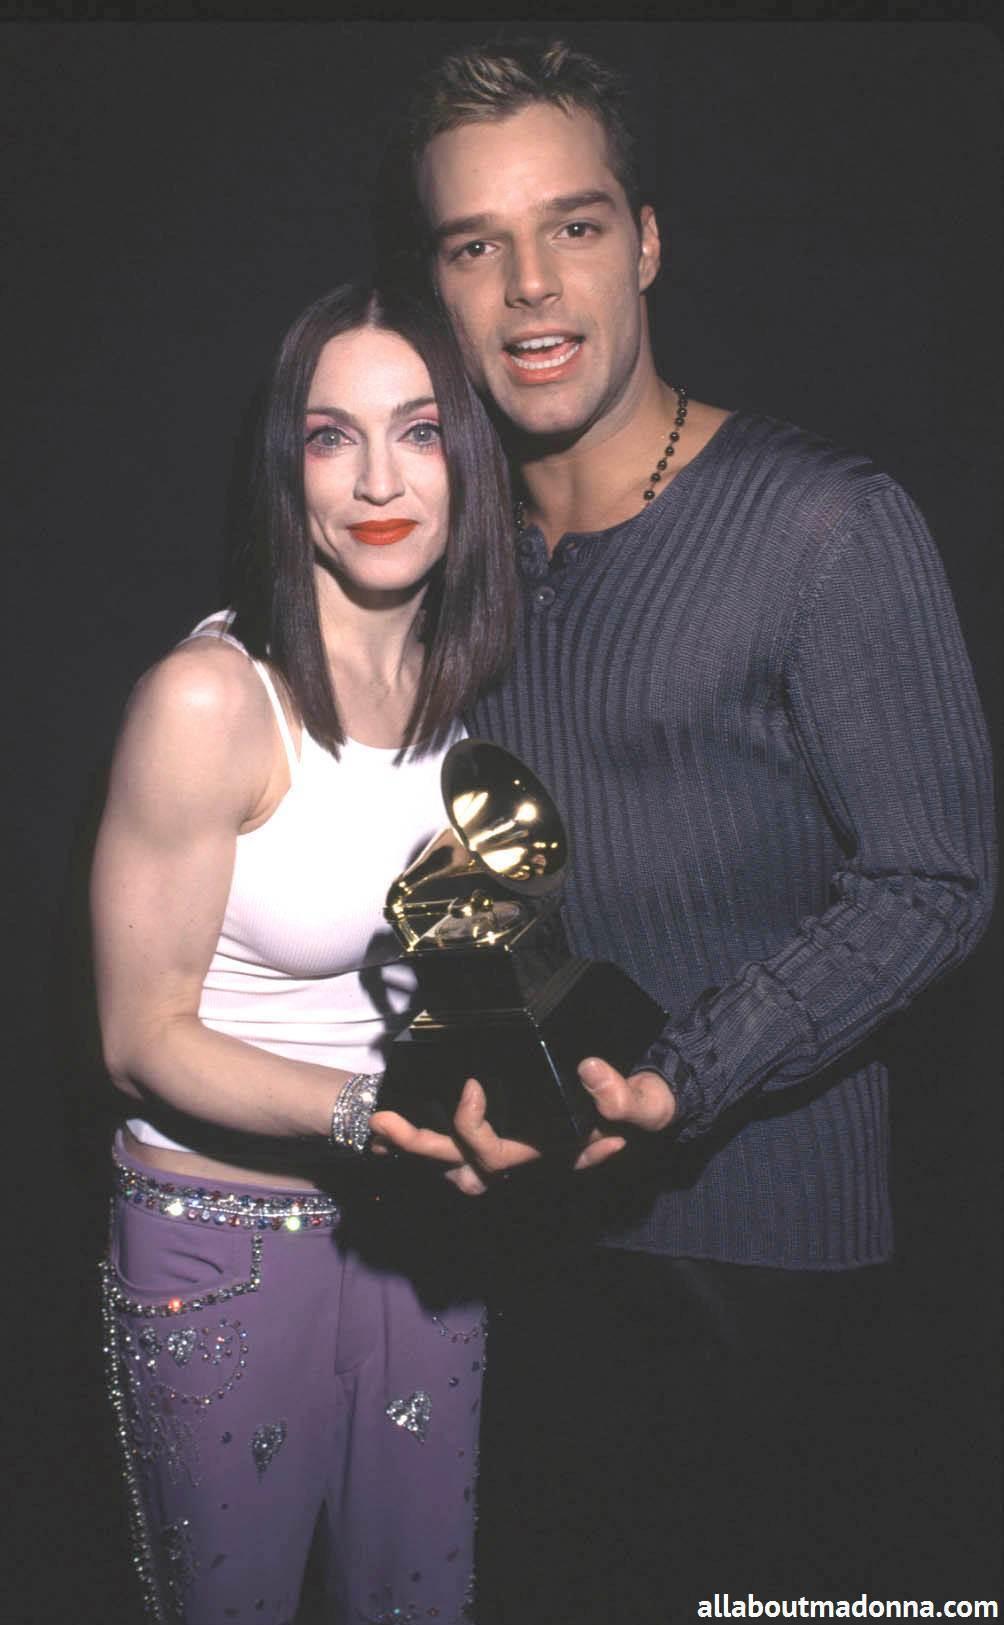 Madonna with Sheryl Crow, Shania Twain and Ricky Martin at the Grammy Awards (February 24 1999)